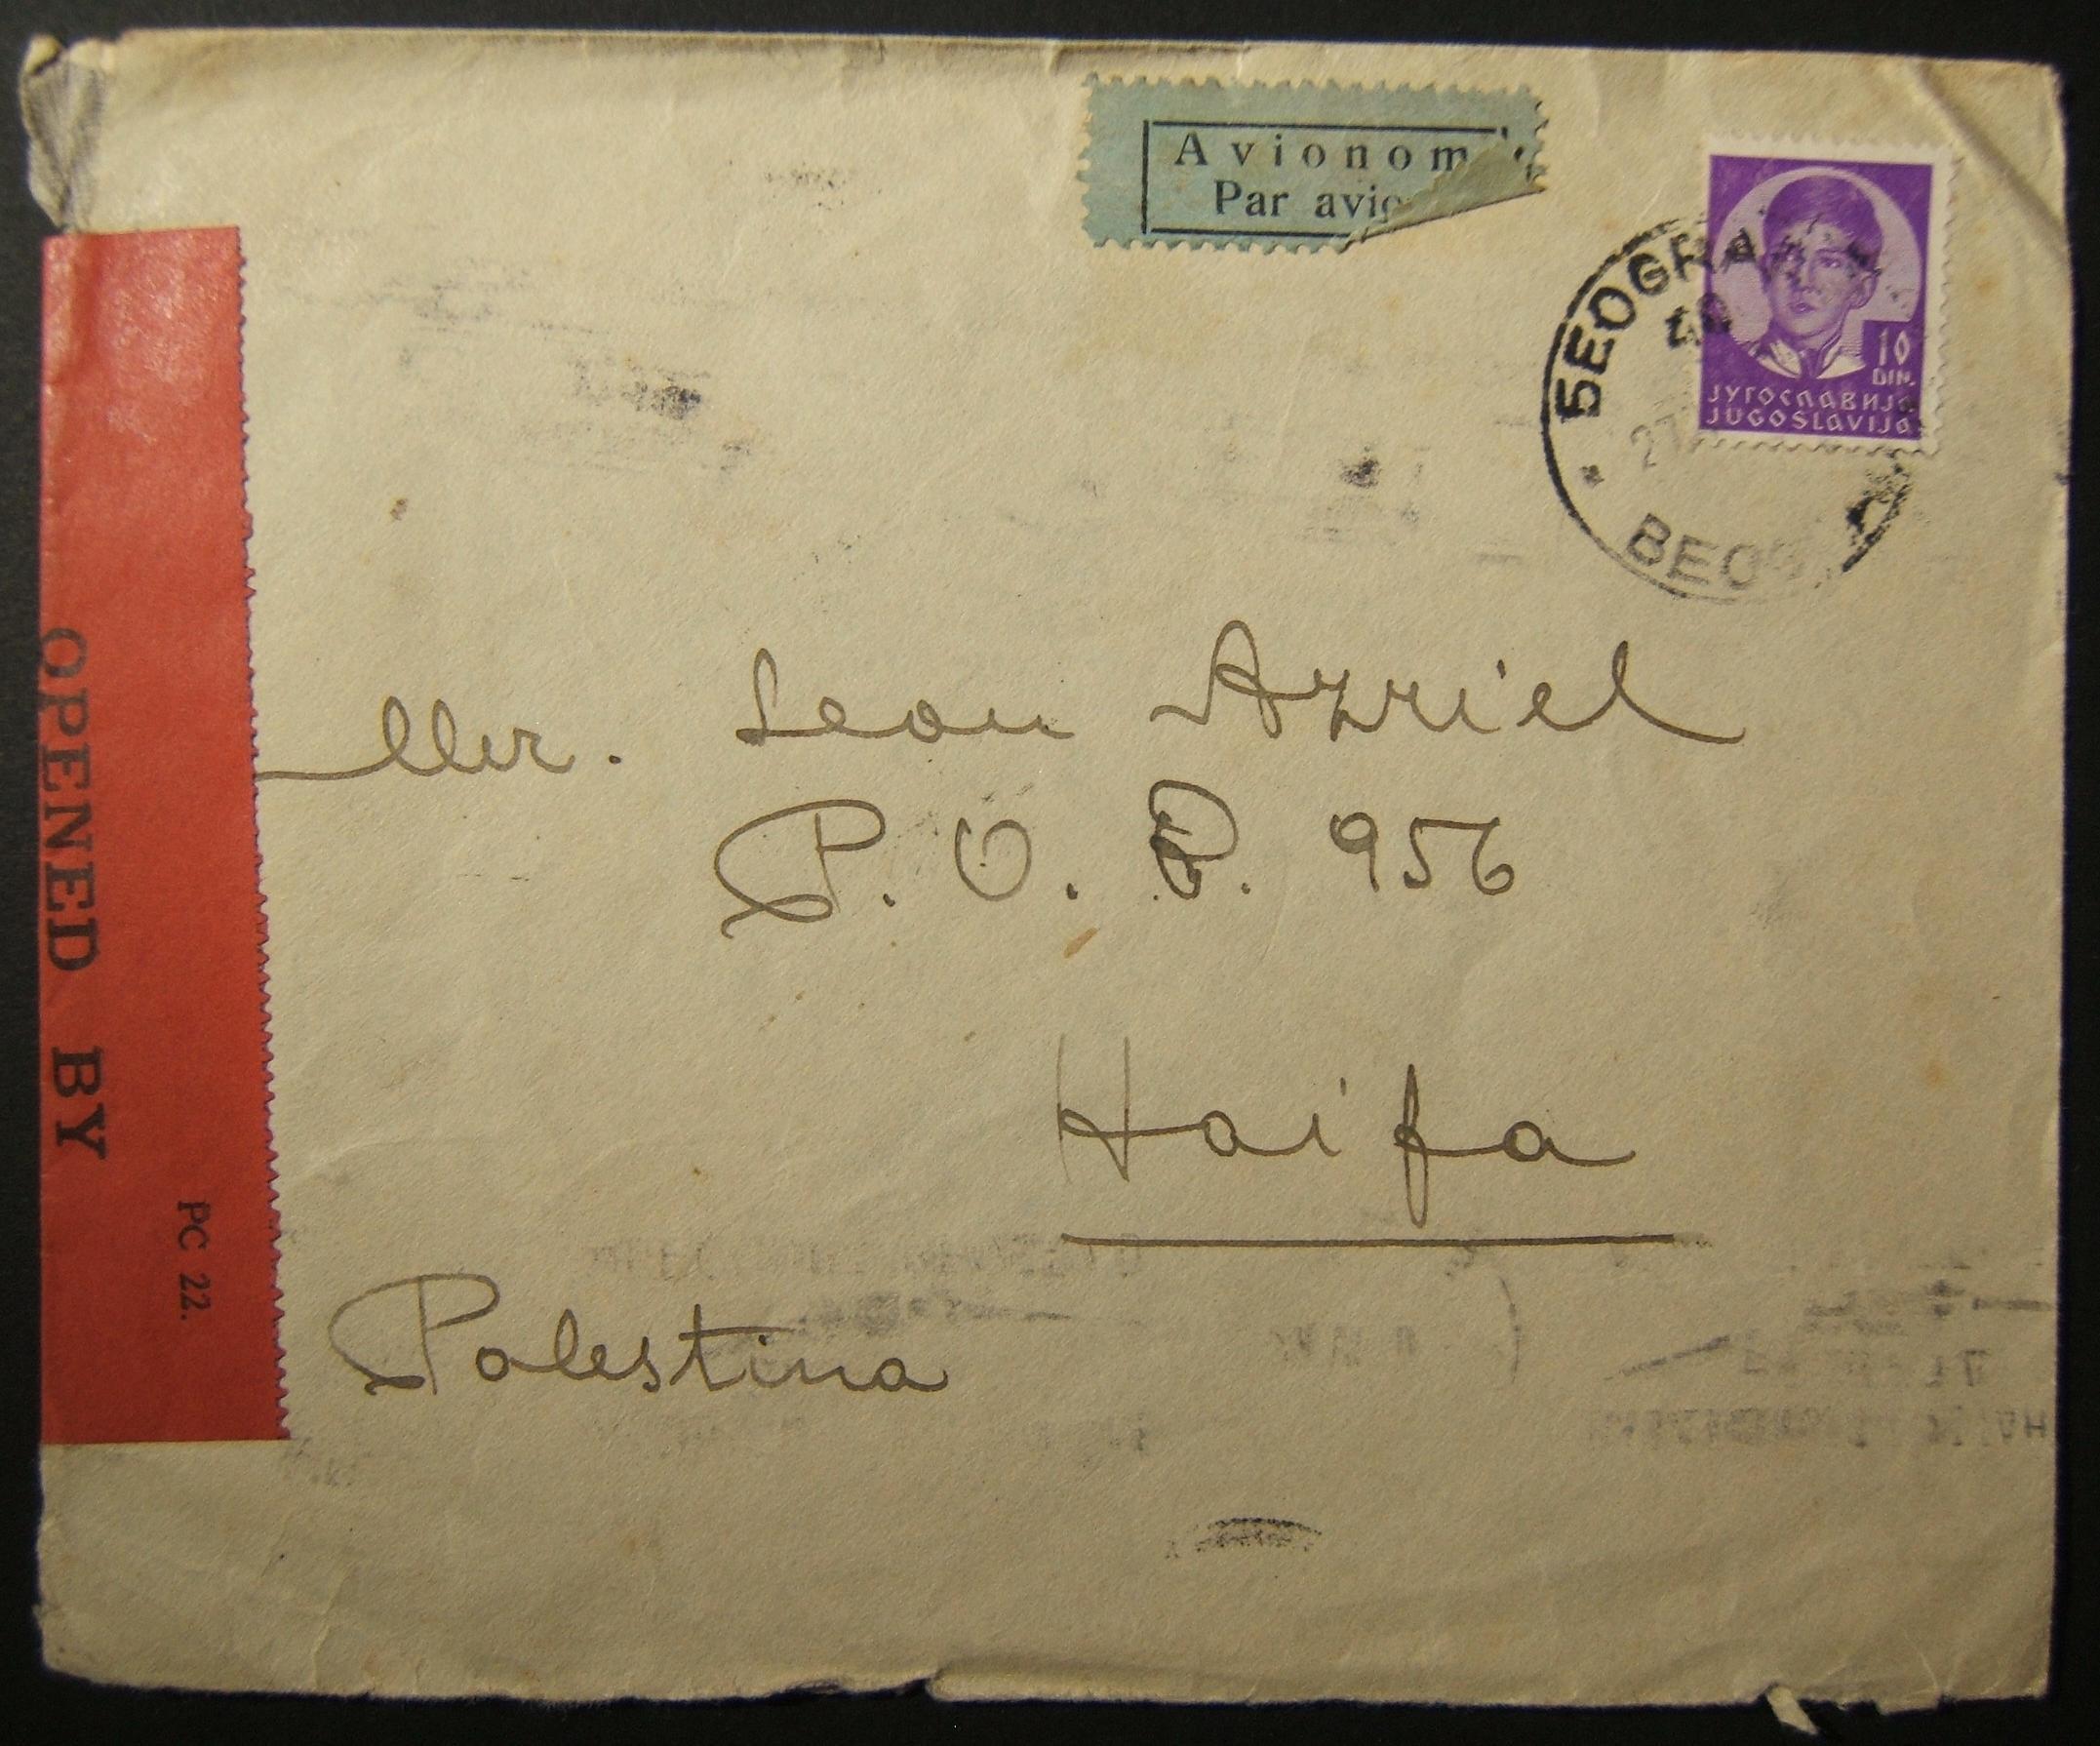 27-06-1940 censored airmail from Yugoslavia to HAIFA probably via Aeroput & Imperial airlines